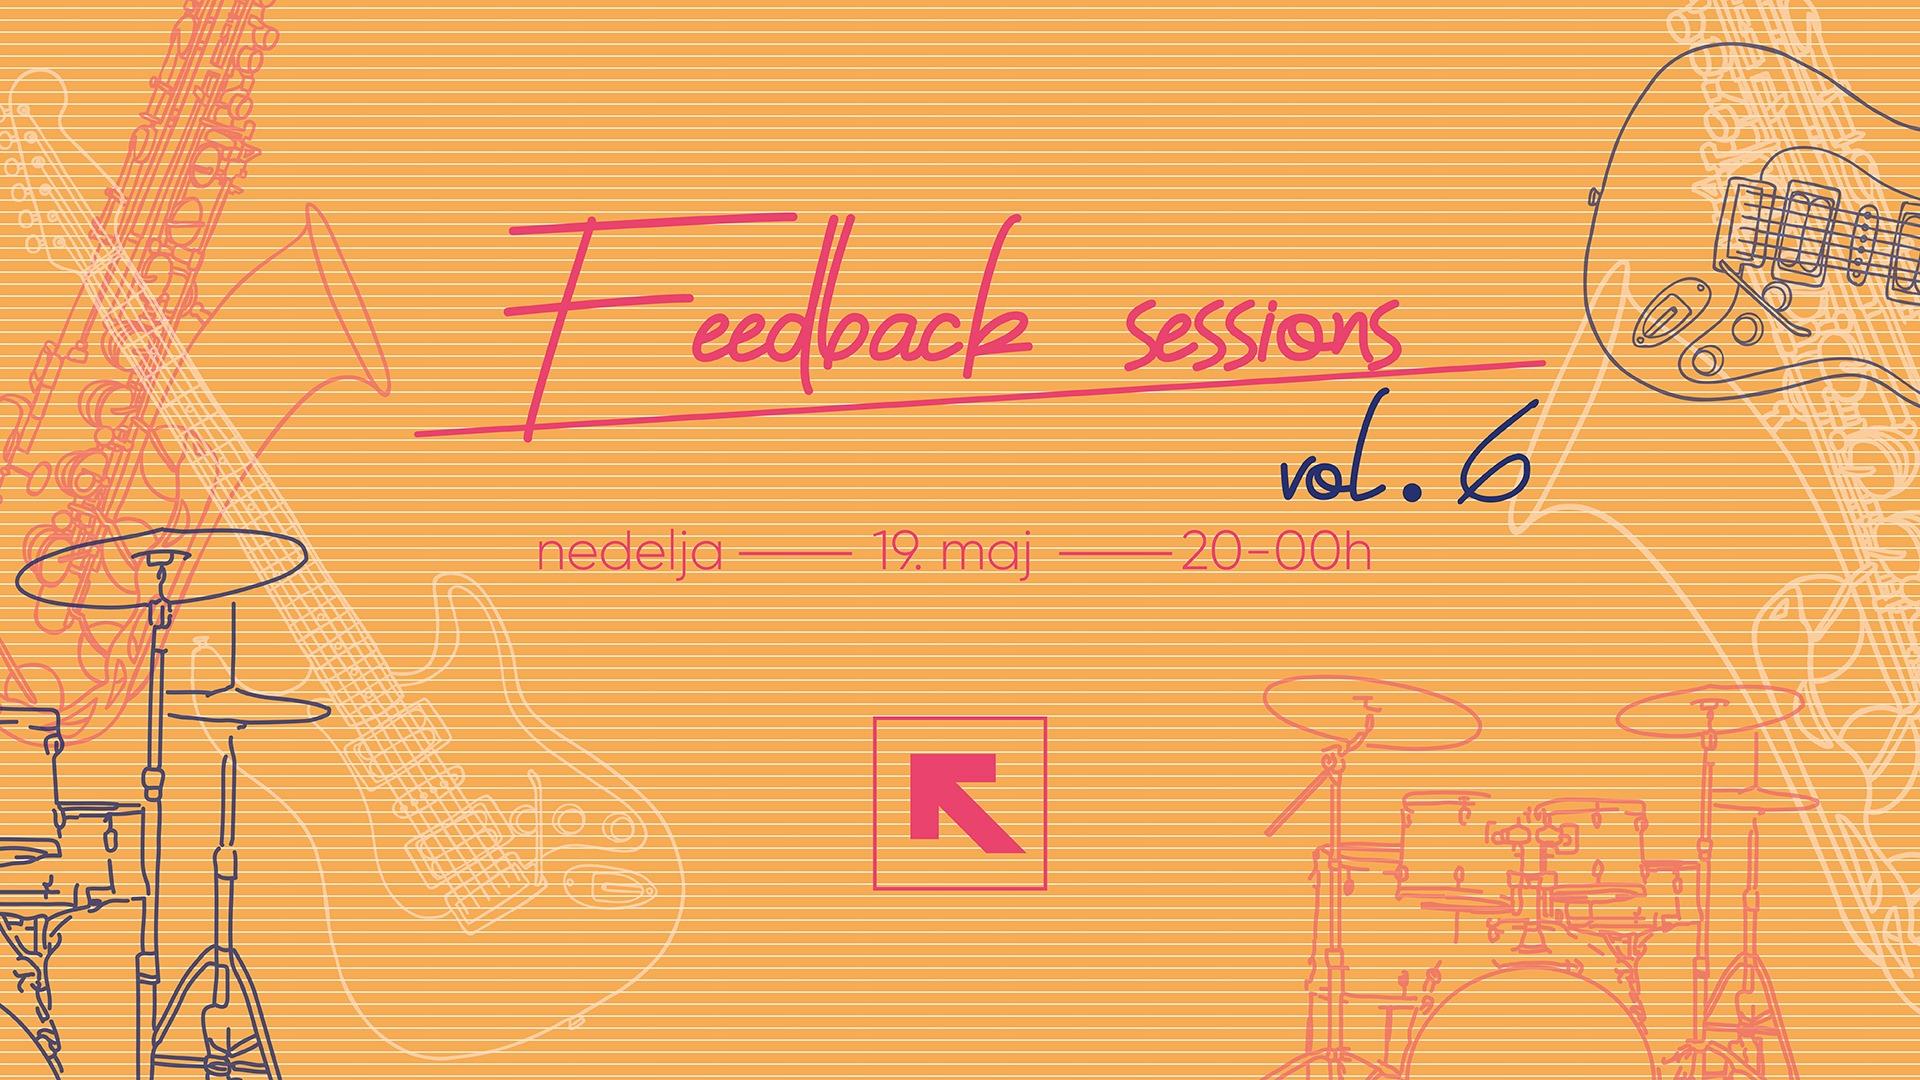 Feedback sessions vol 6 - 19. Maj - Feedback